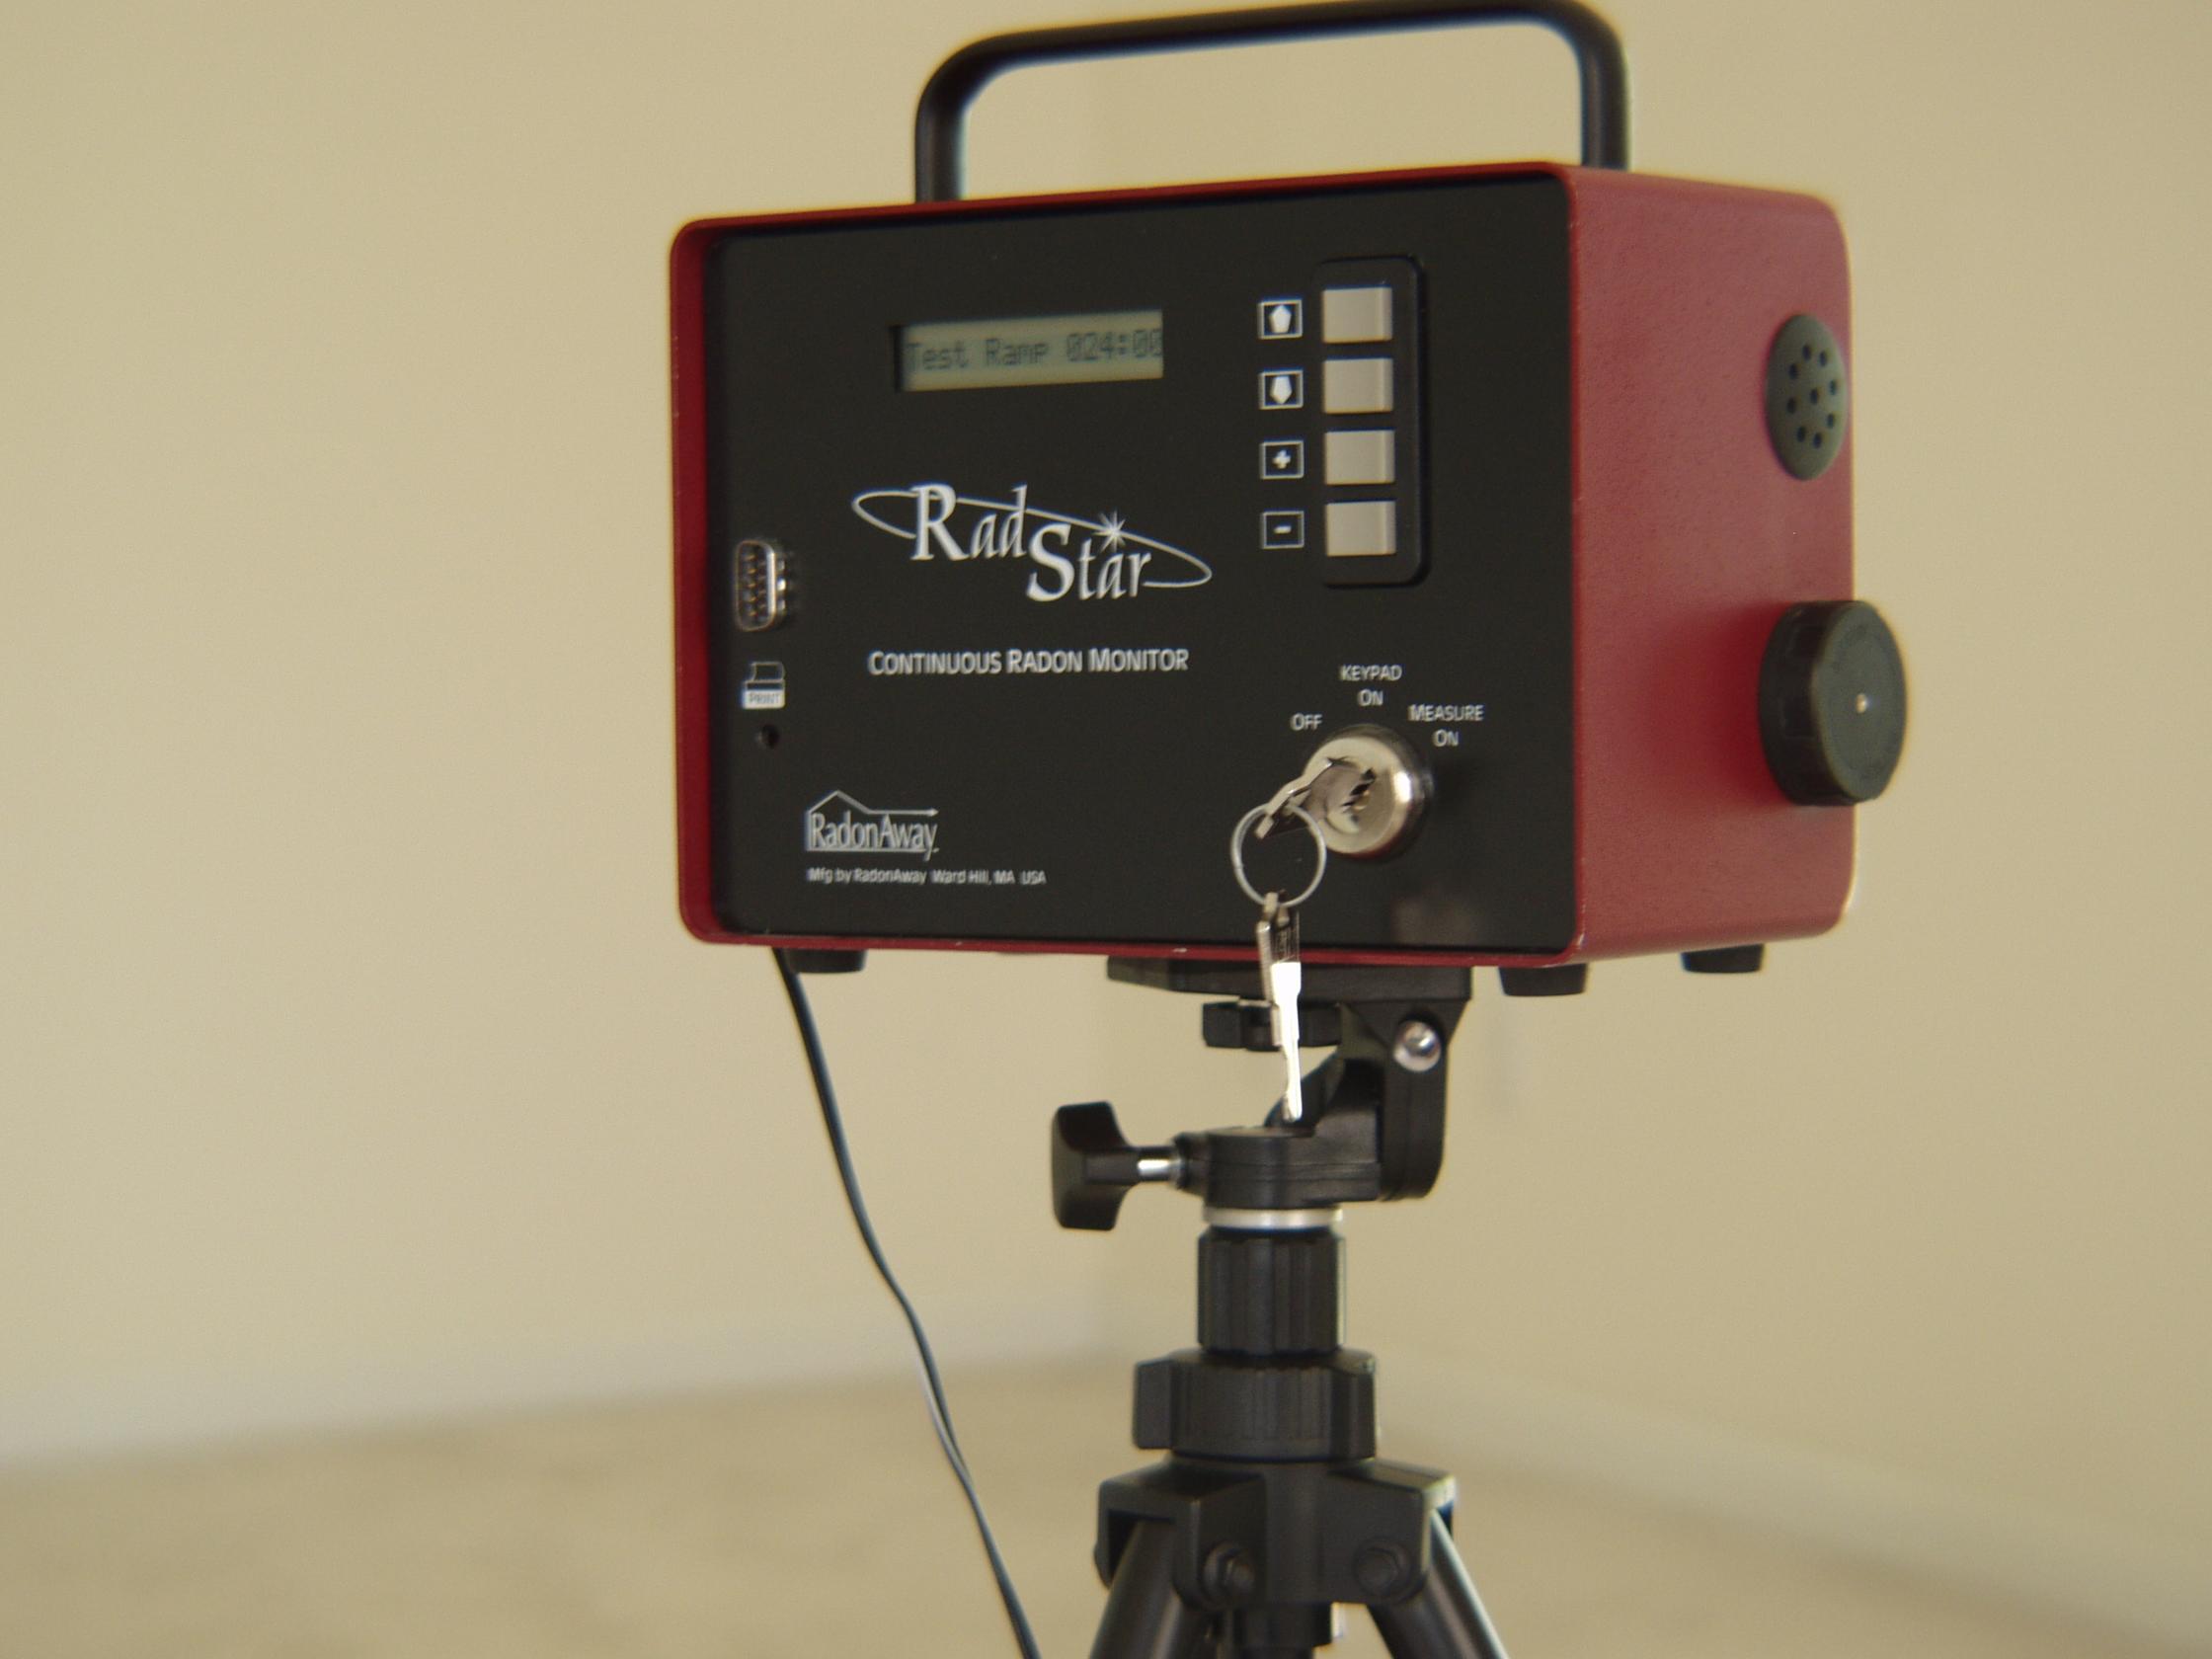 Radon testing equipment, continuous monitor